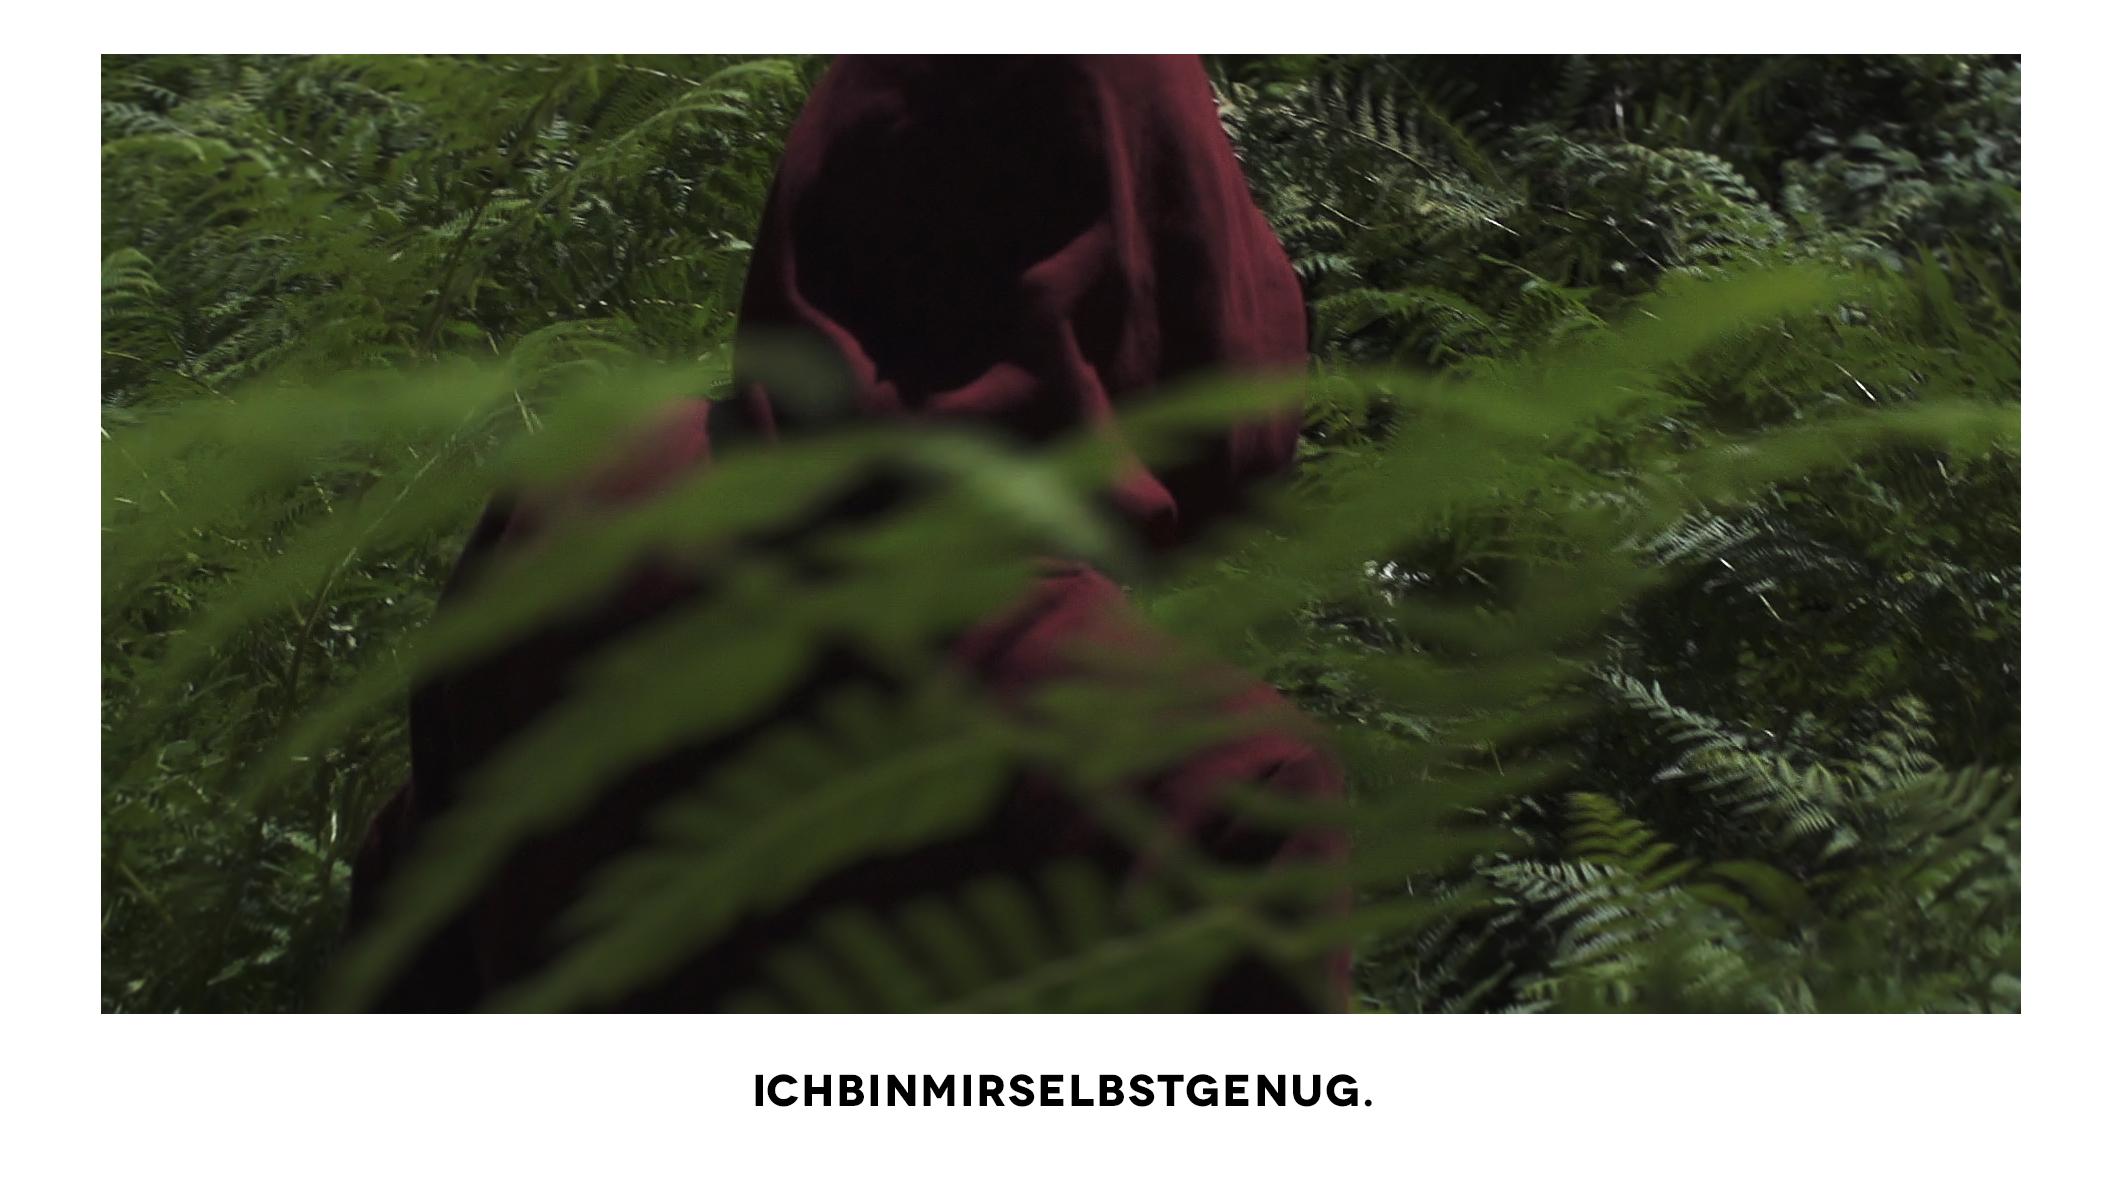 ichbinmirselbstgenug.